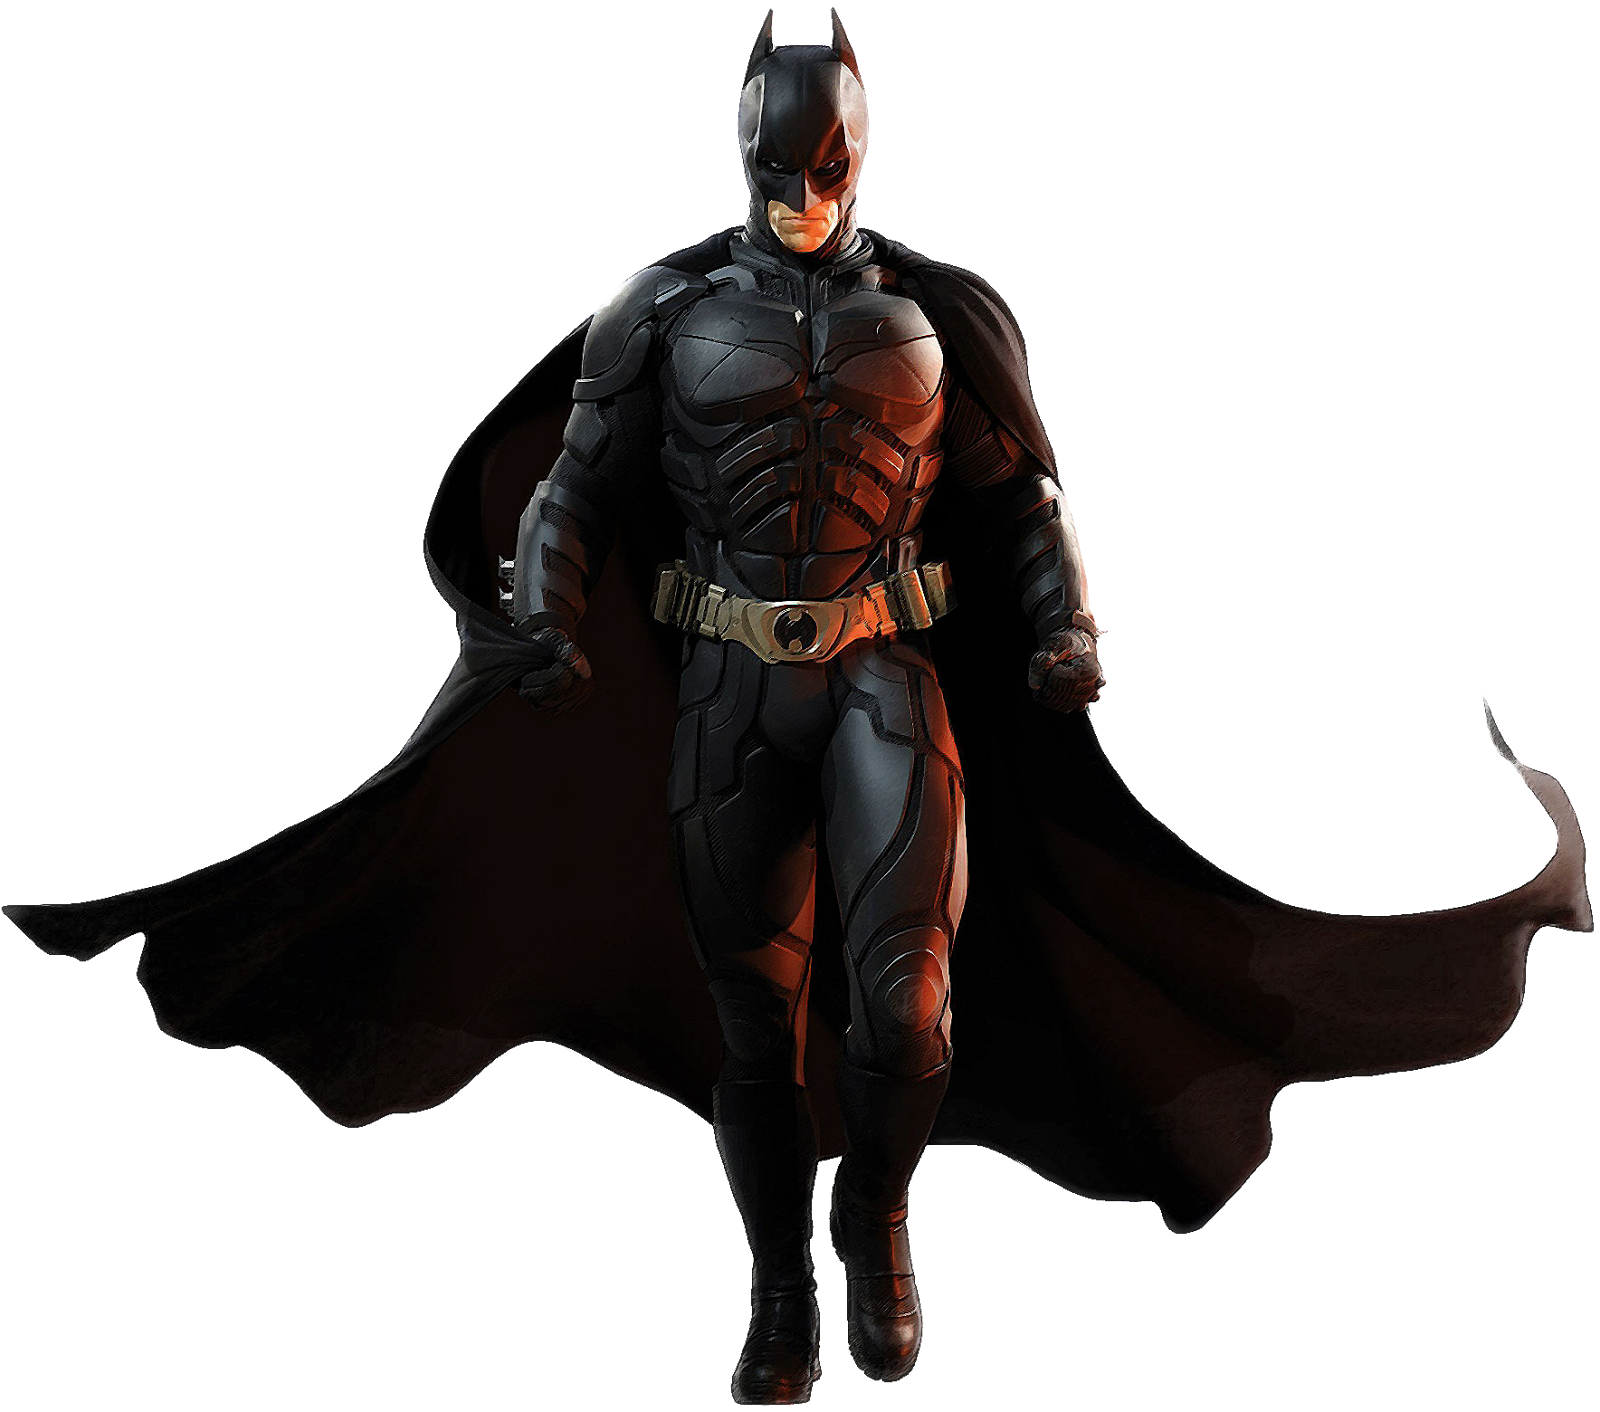 Free download. Batman png images